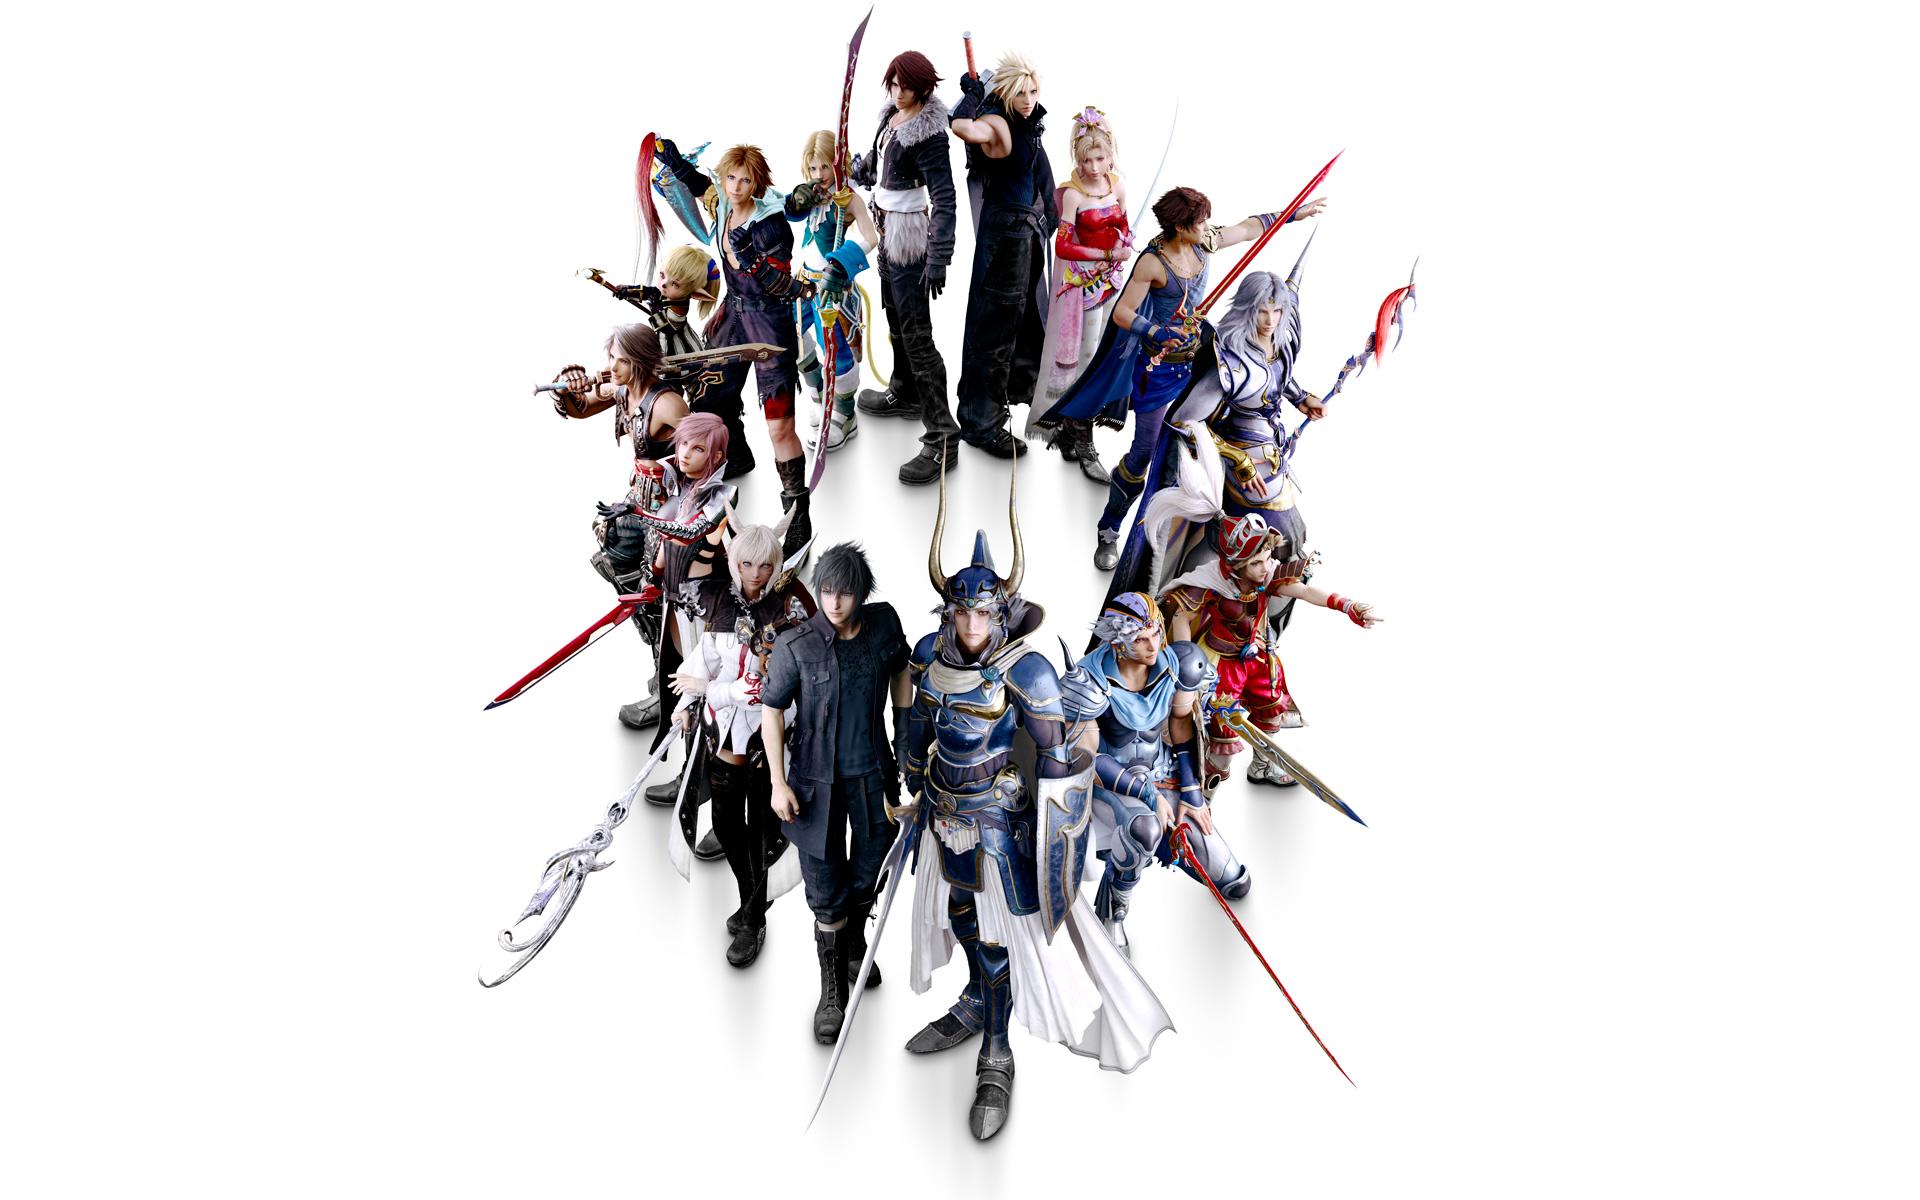 Free Dissidia Final Fantasy NT Wallpaper in 1920x1200